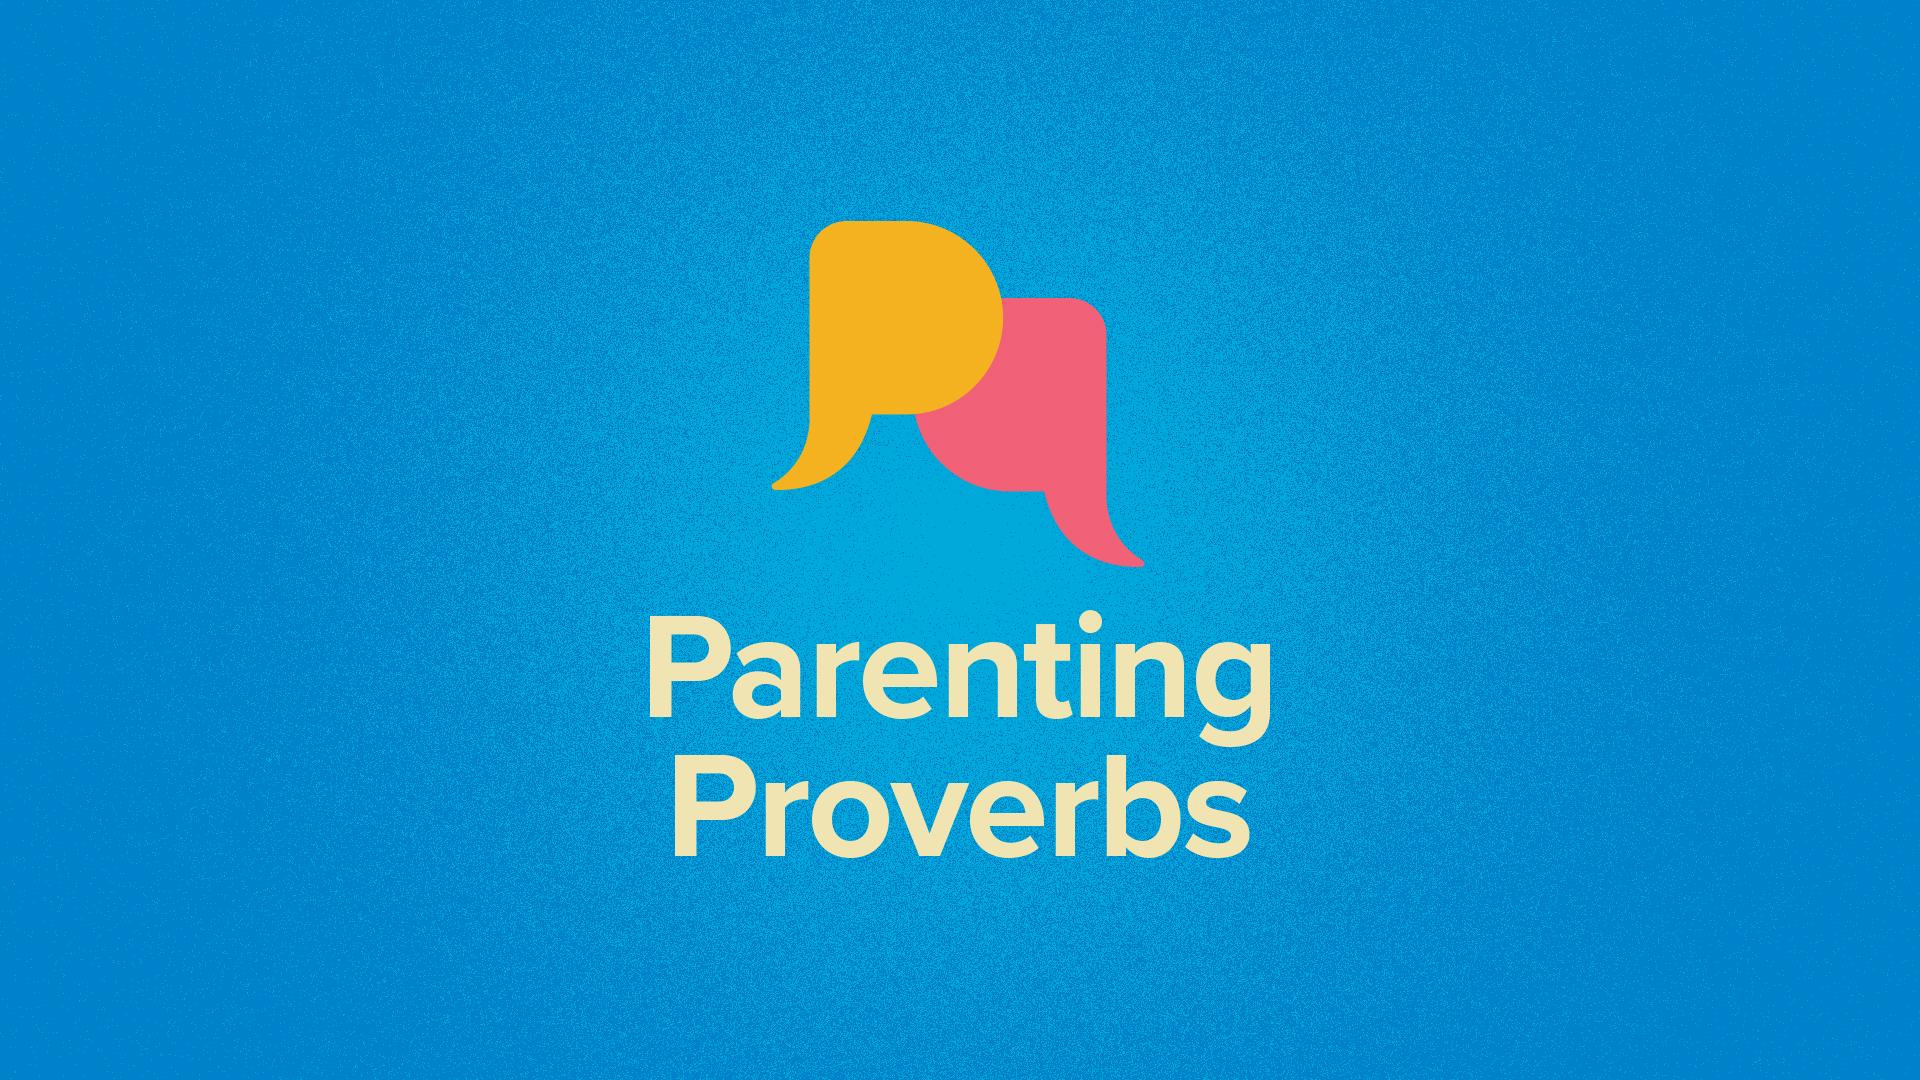 ParentingProverbs_Title_v2.jpg